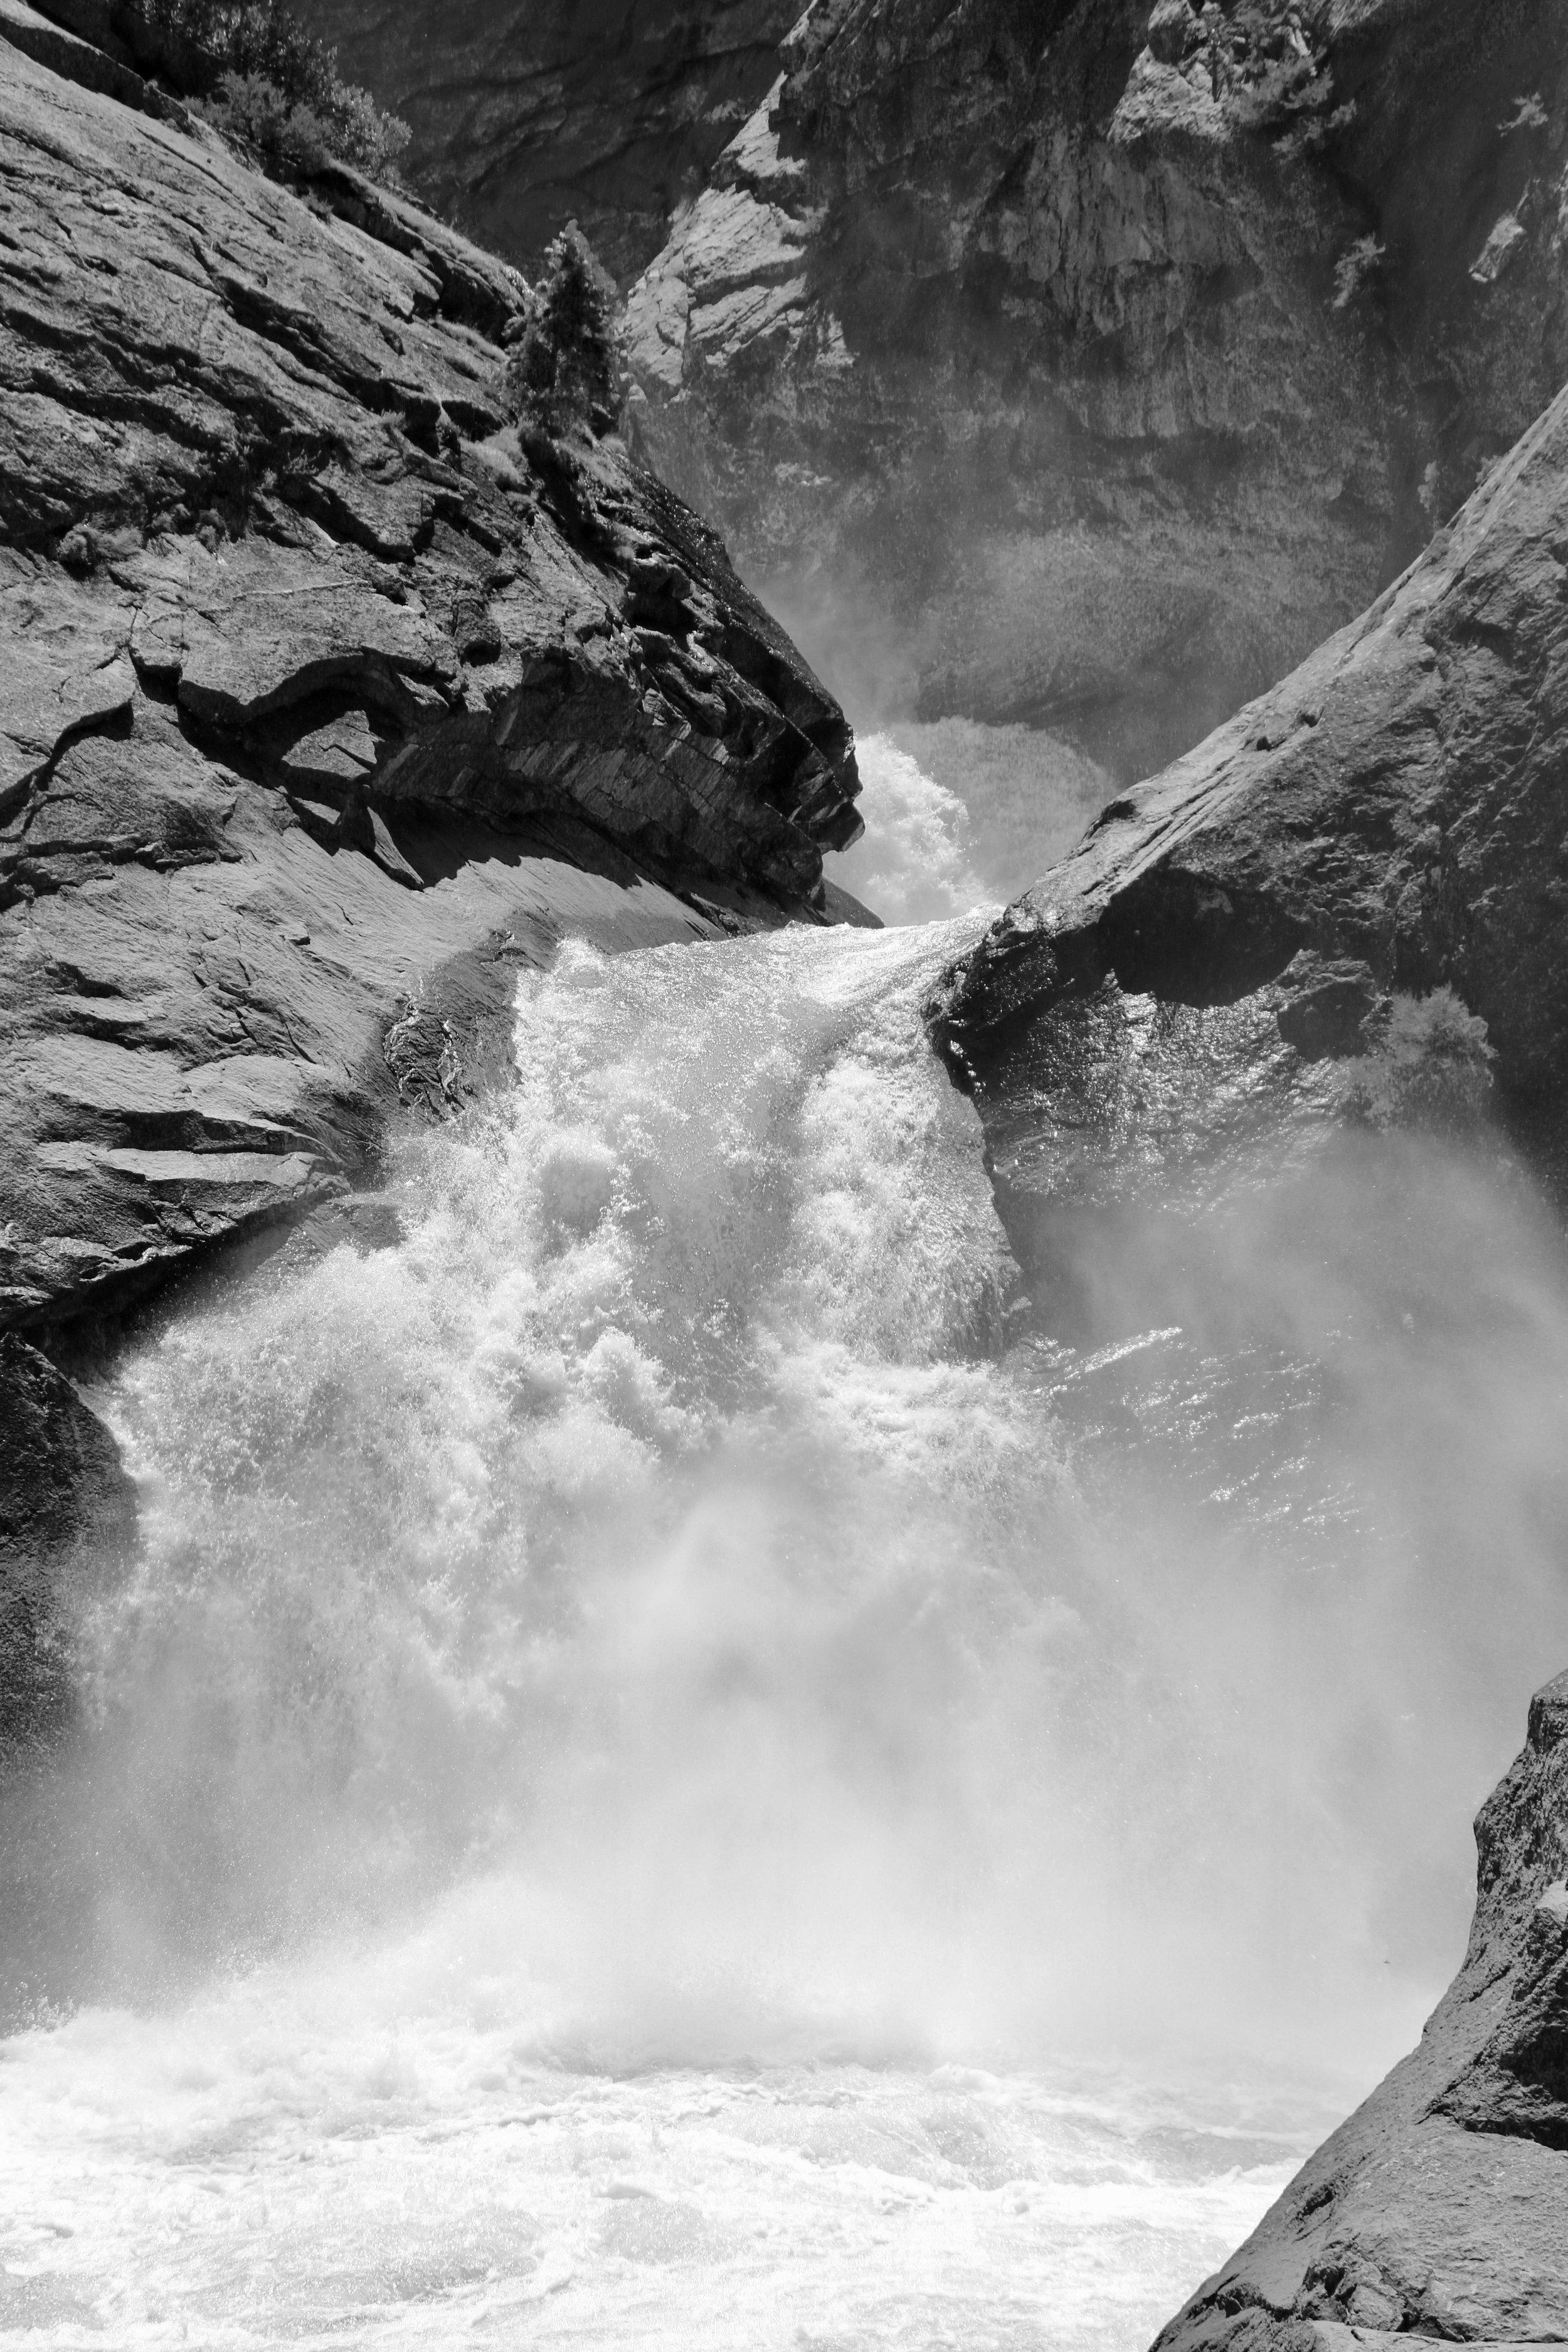 Roaring River Falls - King's Canyon